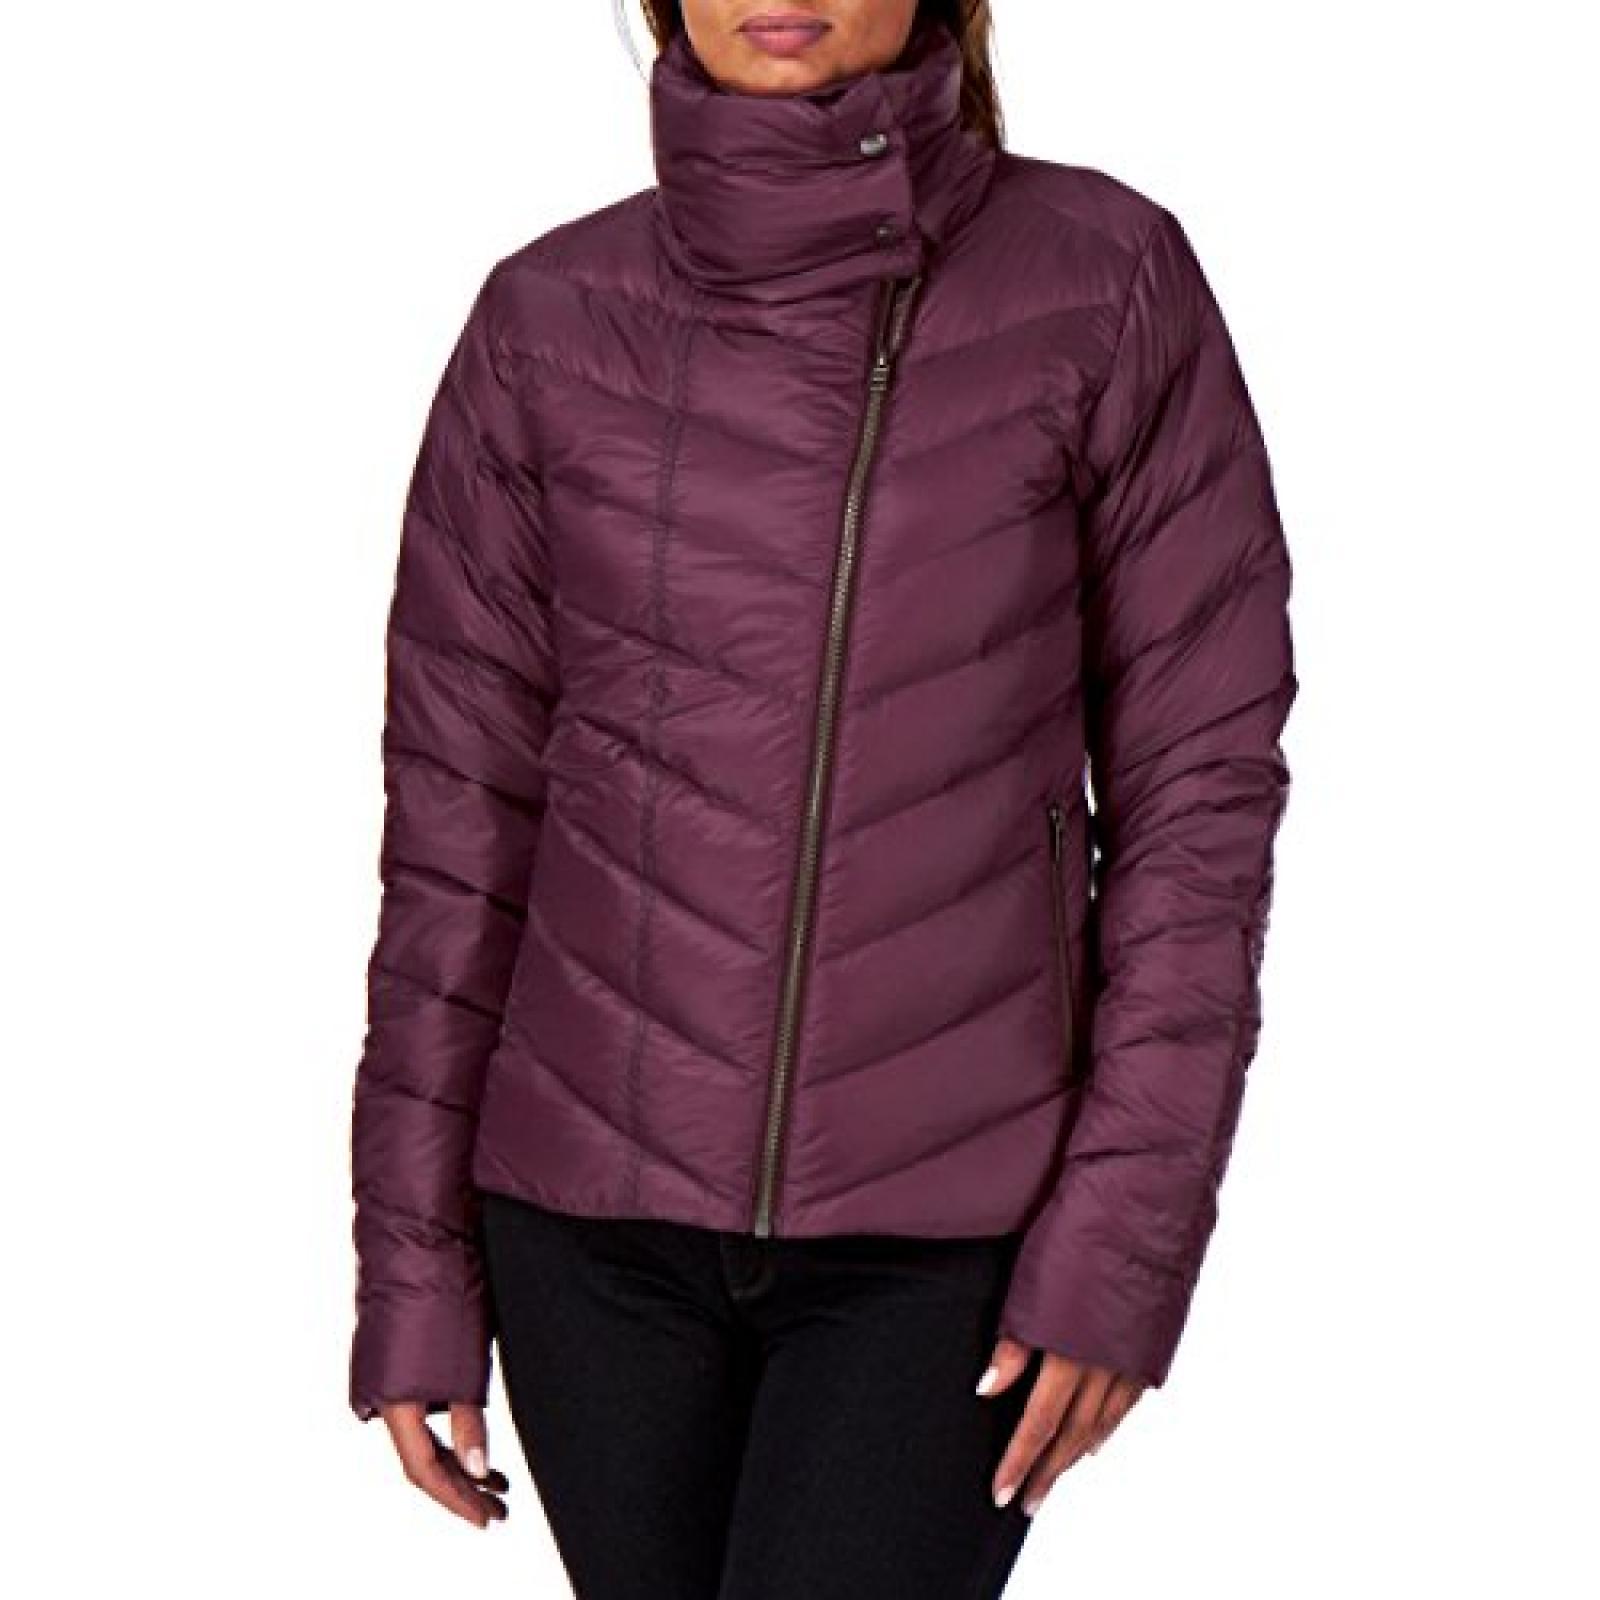 Patagonia Prow Jacket - Dark Currant